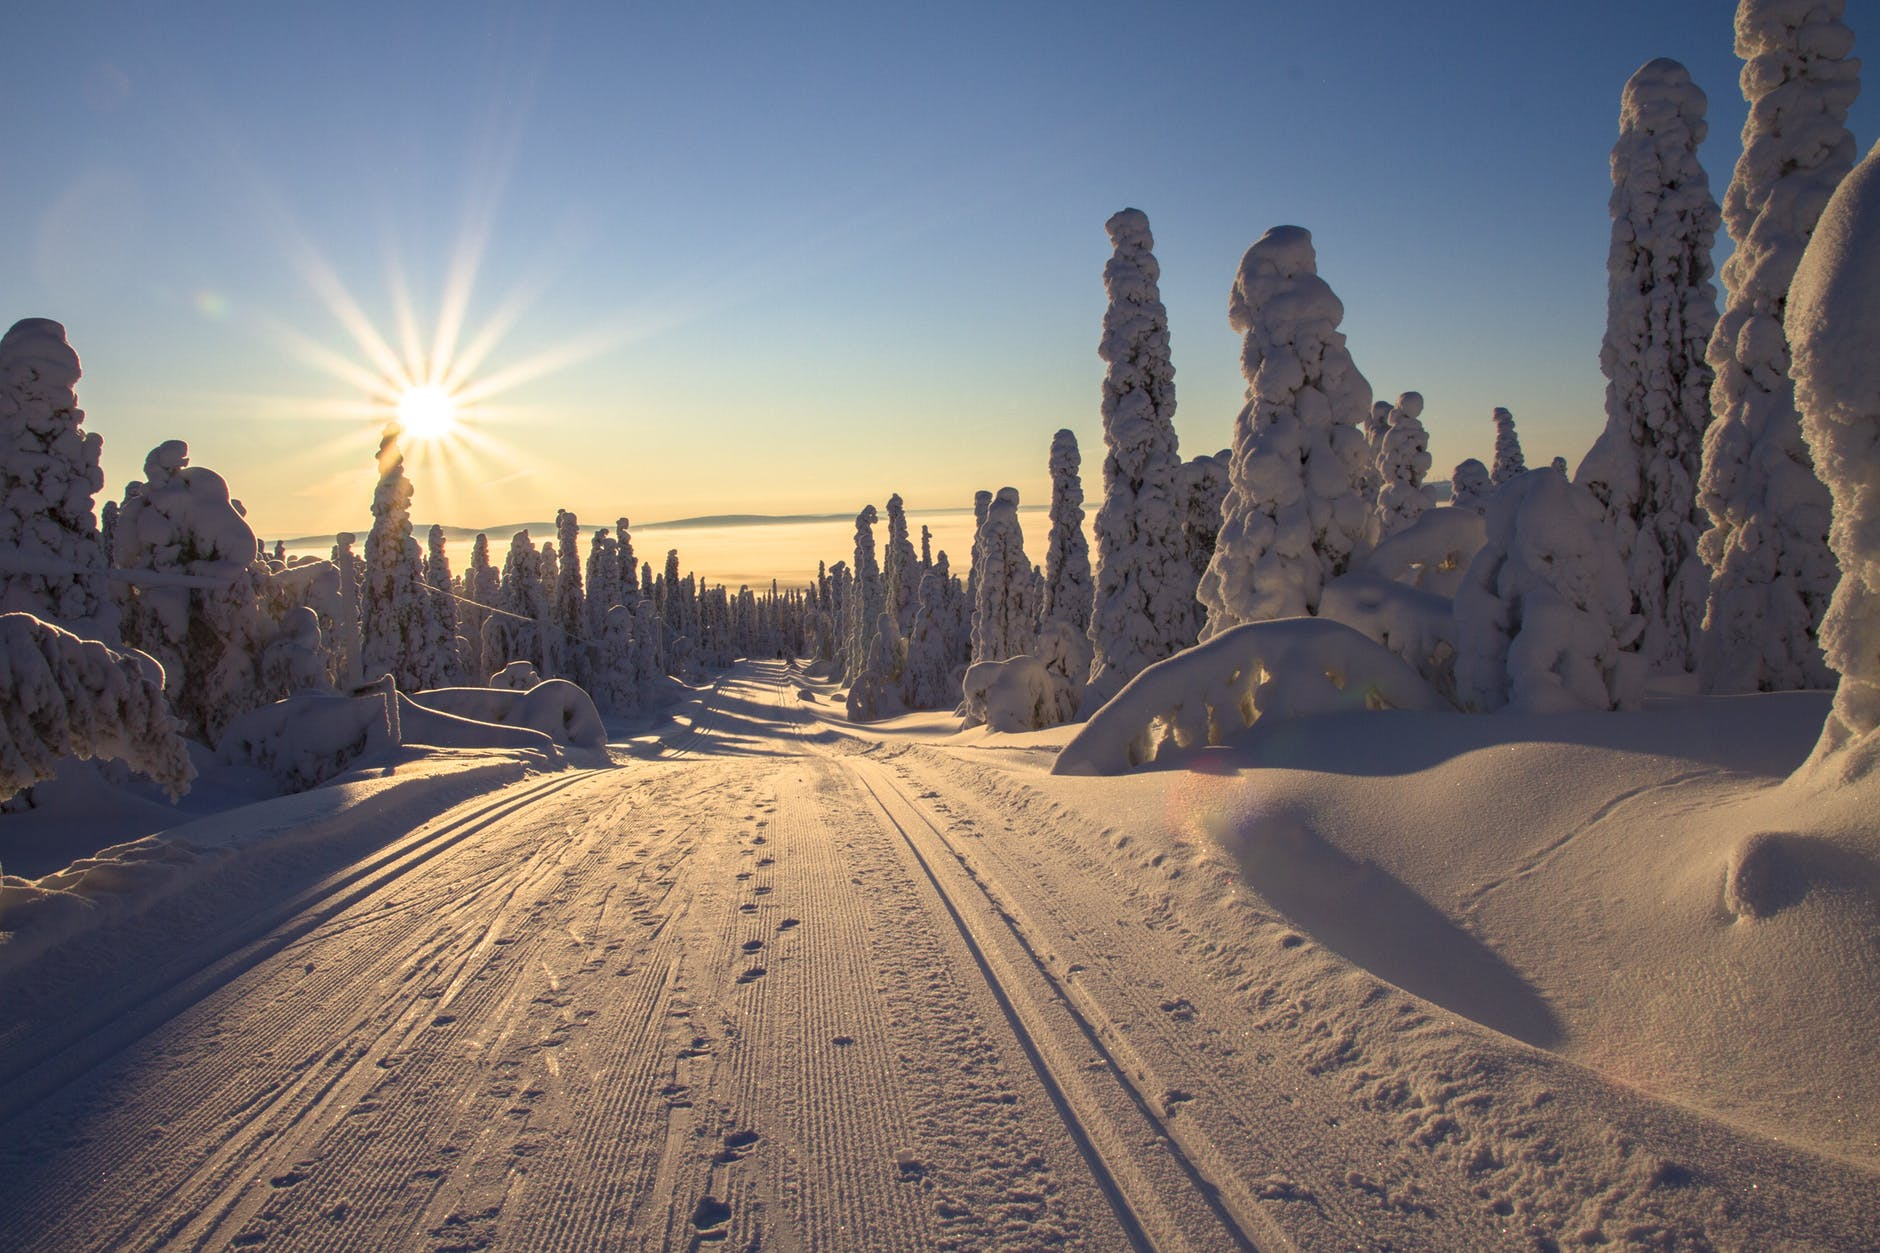 ICR332: Joanna Nylund, The Finnish Art of Courage